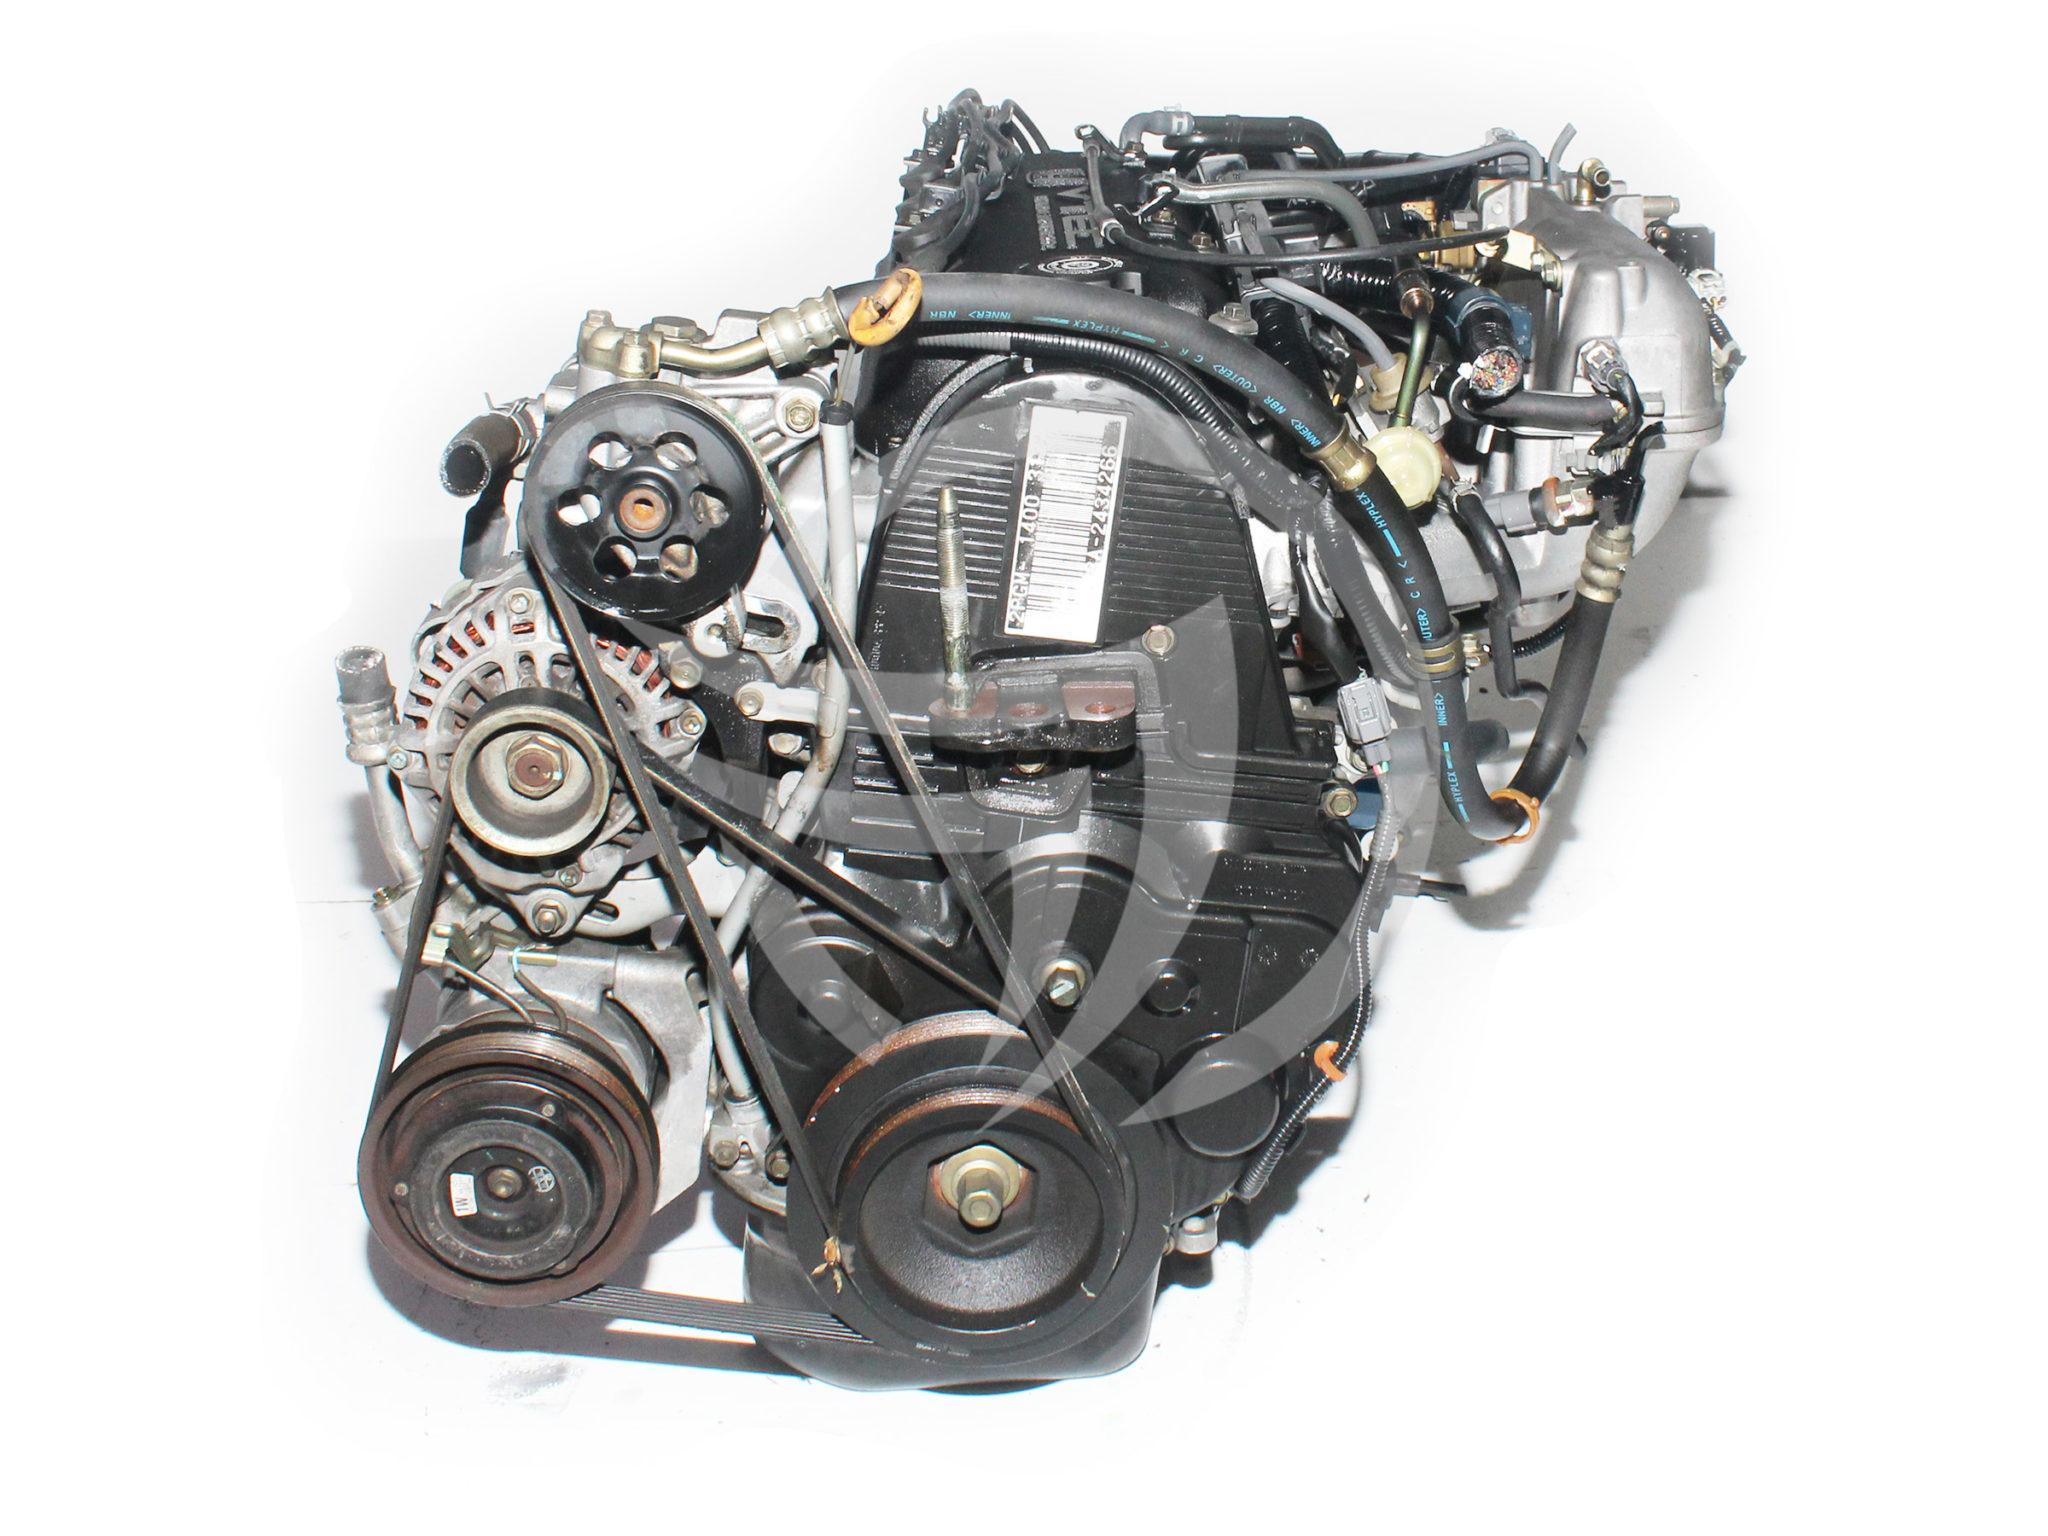 98 02 HONDA ACCORD F23A 2.3L SOHC VTEC AUTOMATIC TRANSMISSION JDM F23 AUTO TRANS